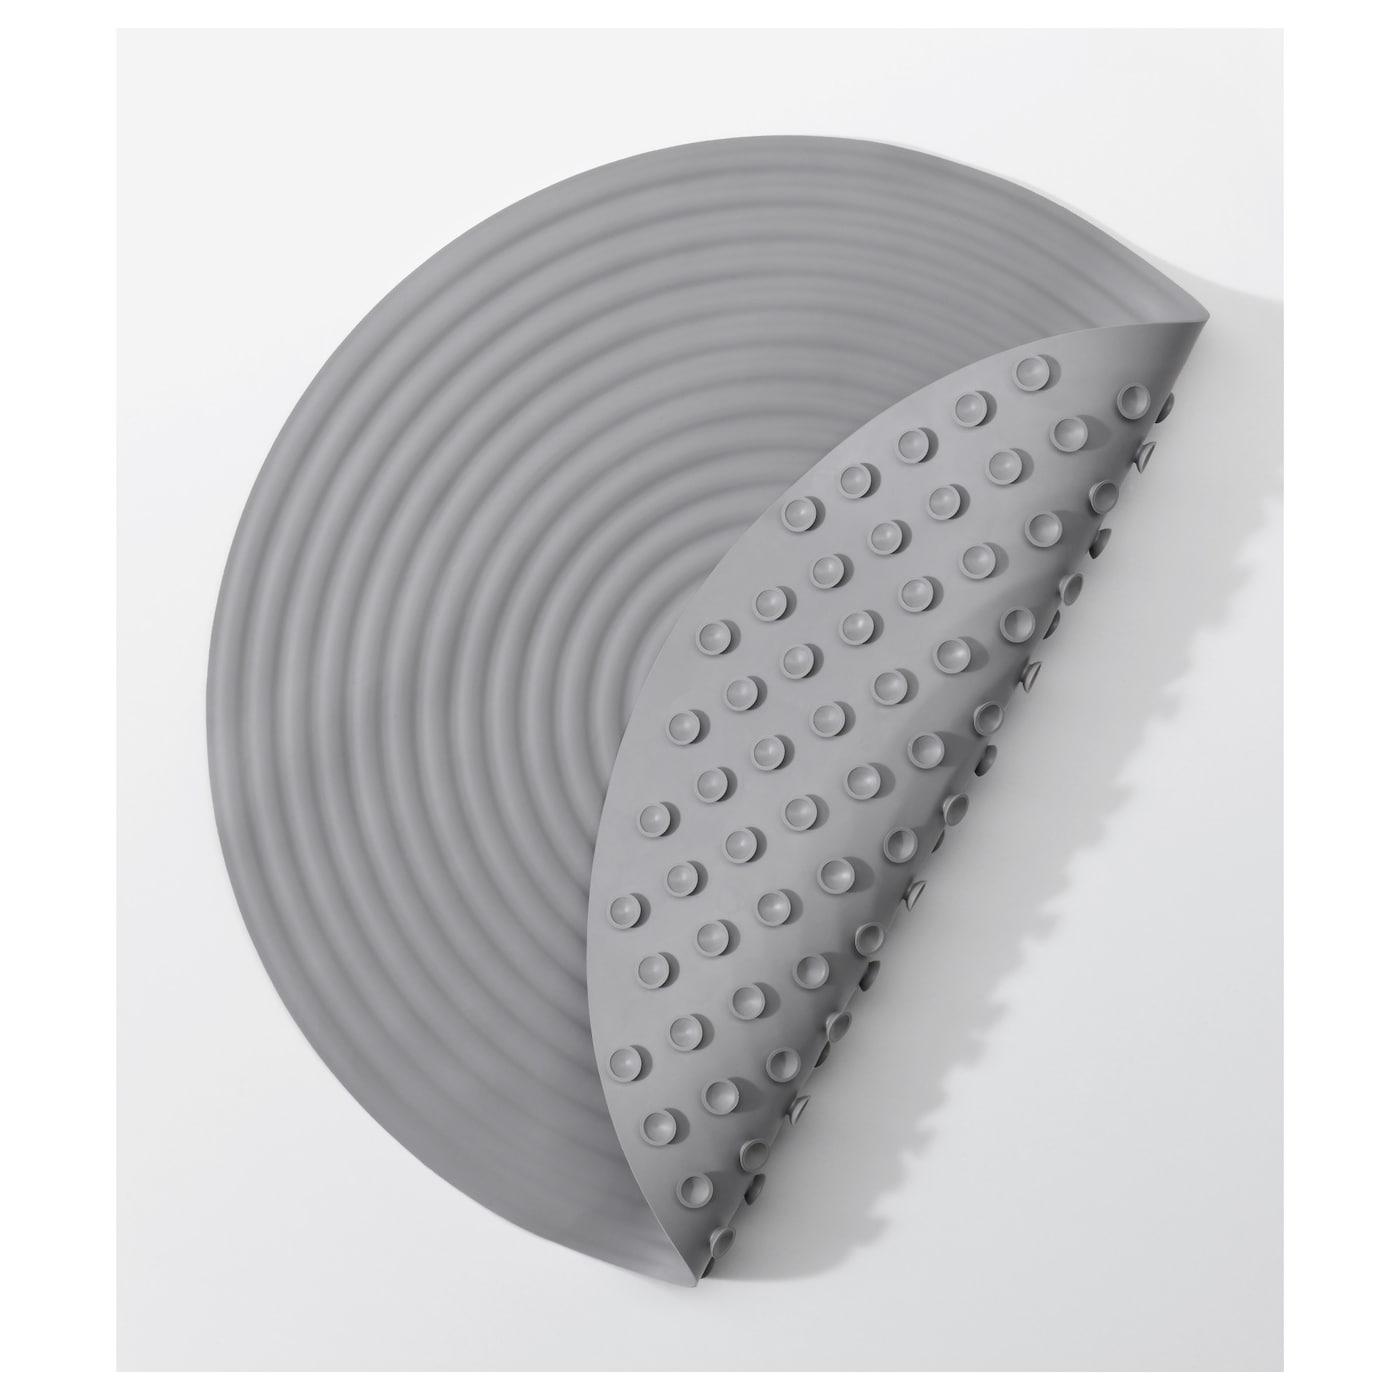 products mat stone cotton mats classic parachute shower tub floor home